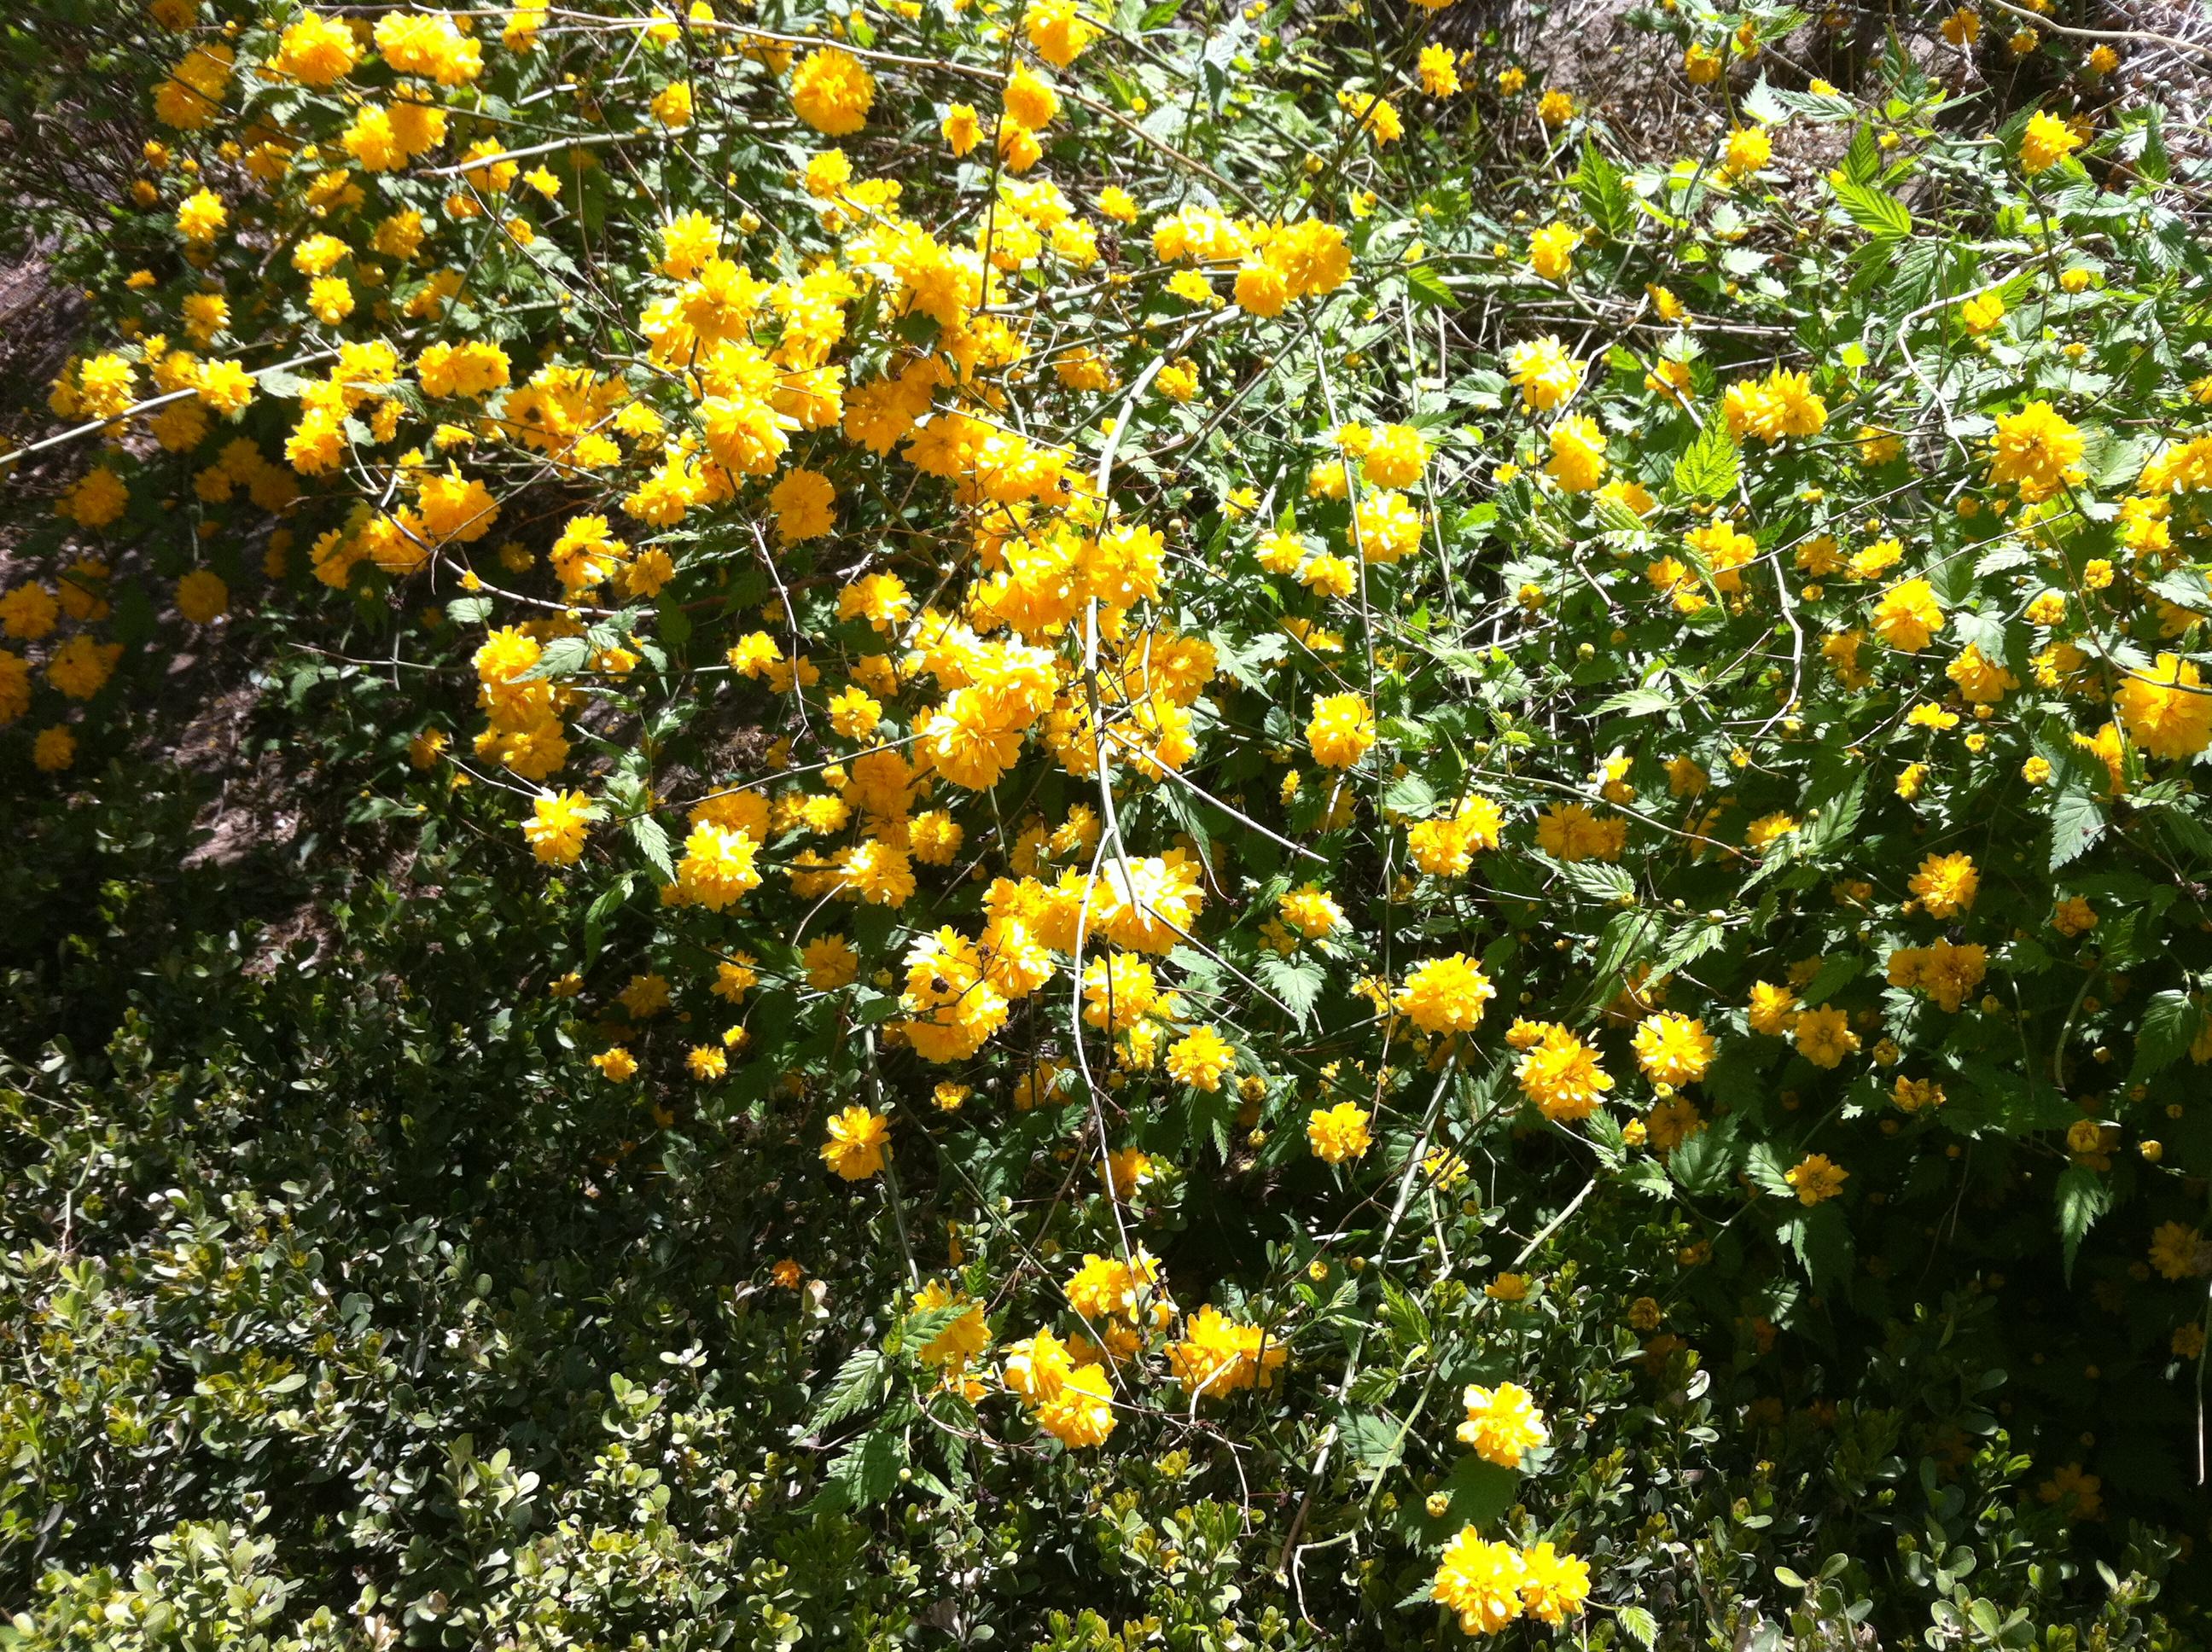 Flowering Weeds The Heart Thrills